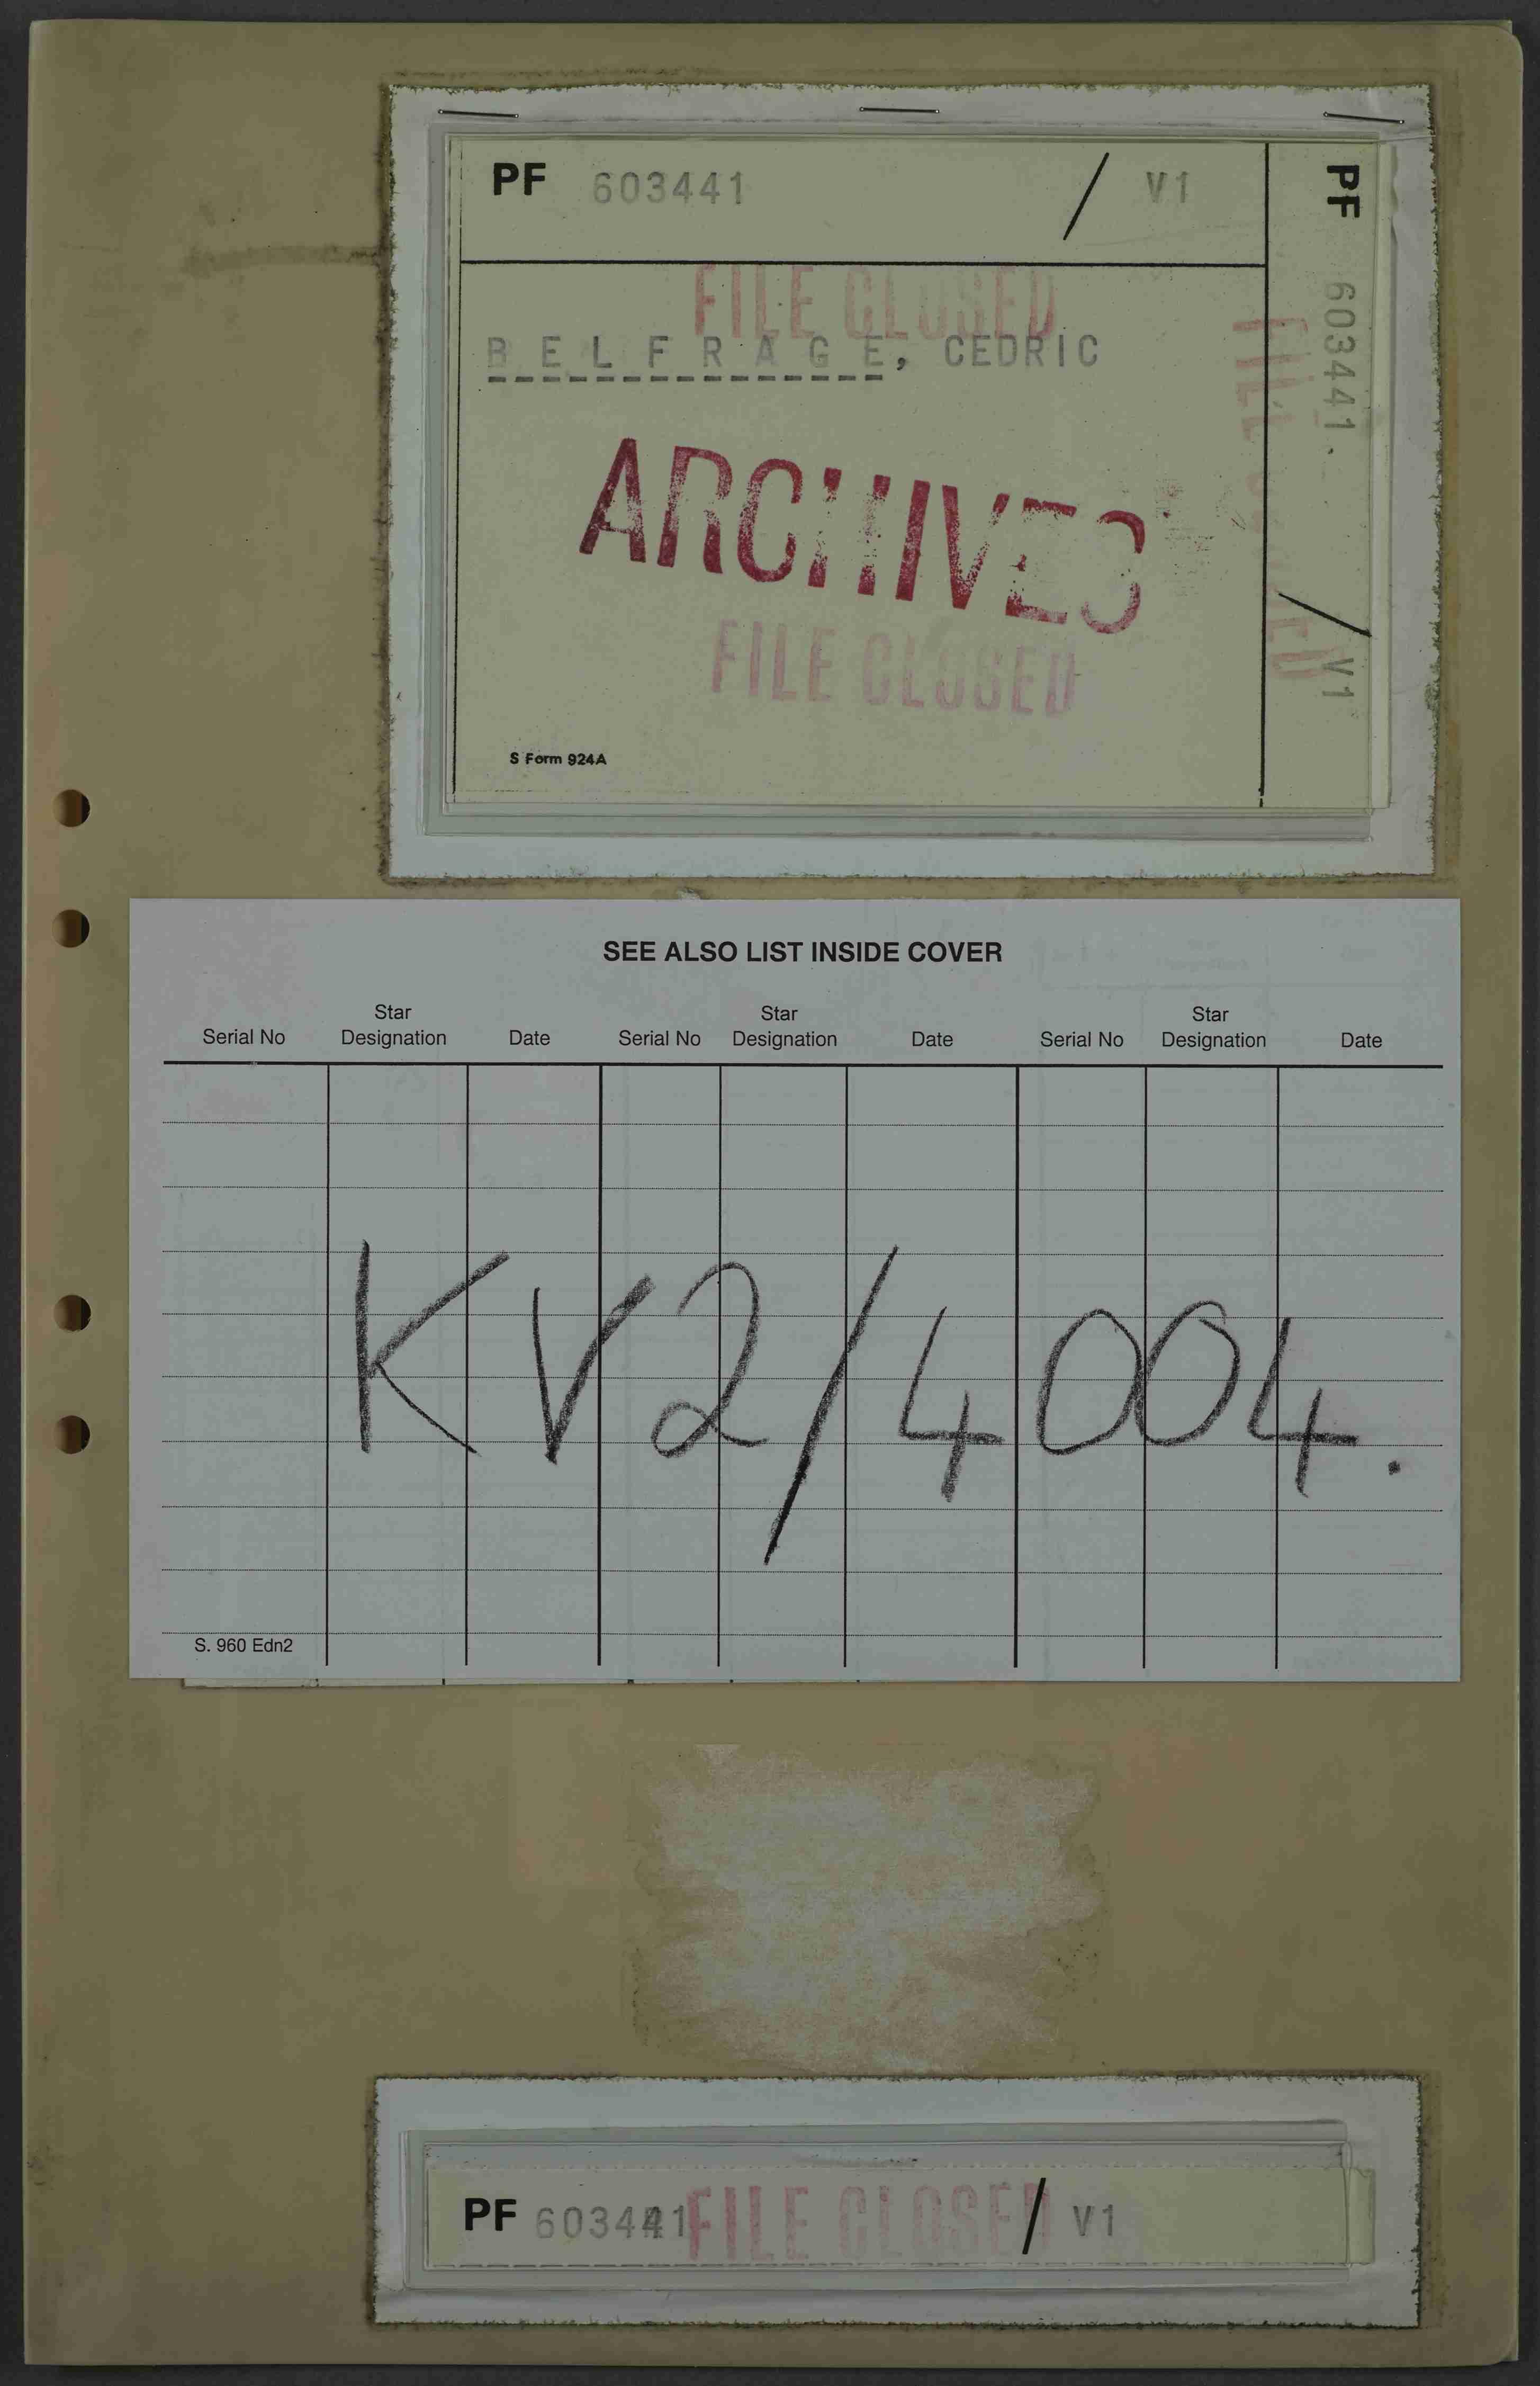 The Belfrage File